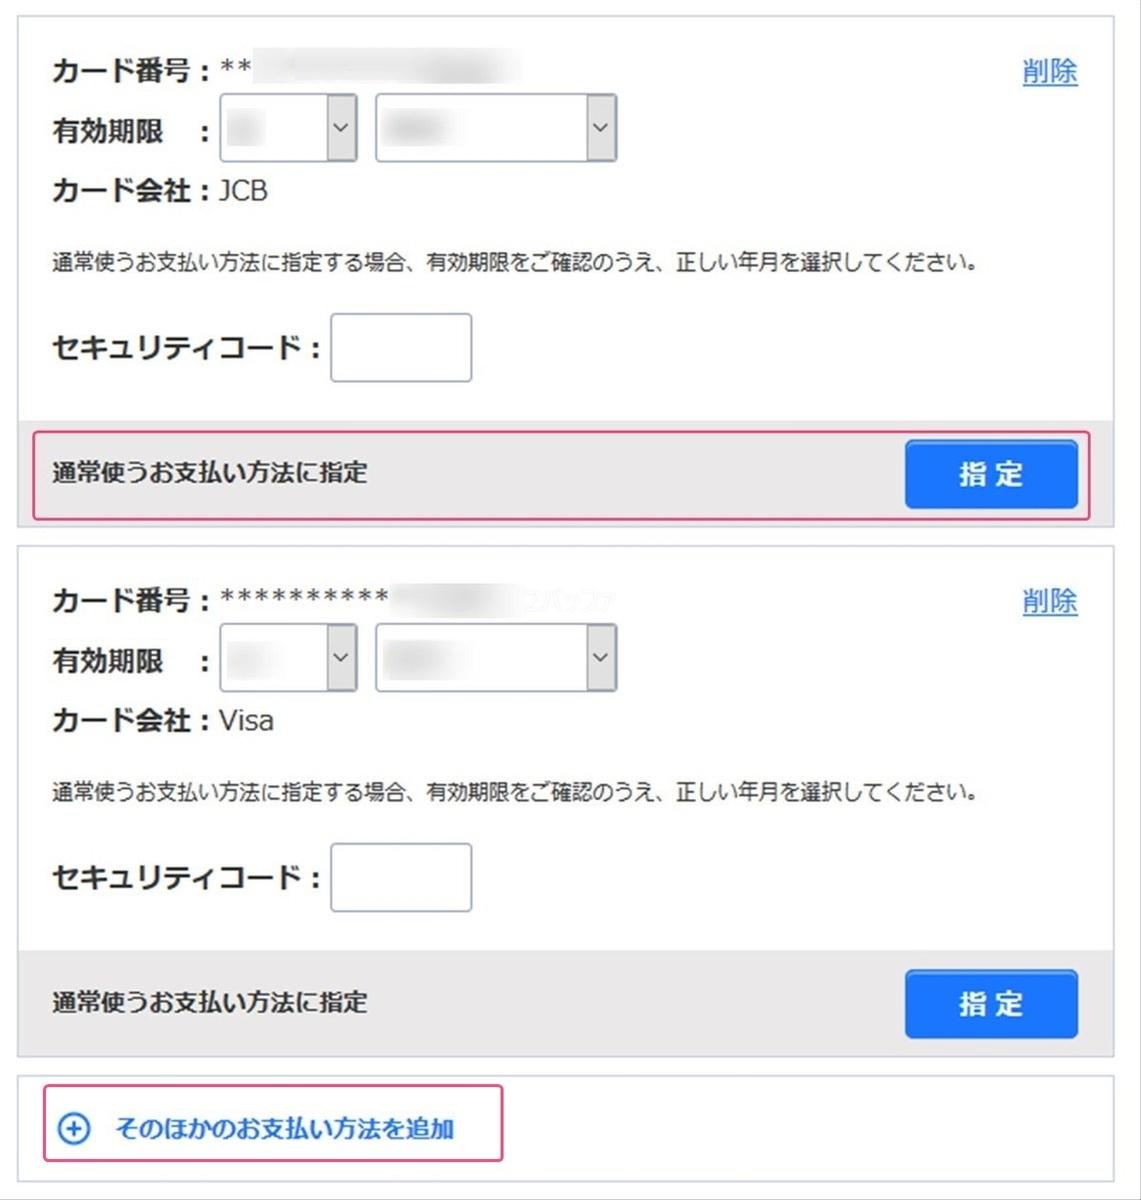 Yahoo公金払いでLINE Payカードを通常使うカードに設定する